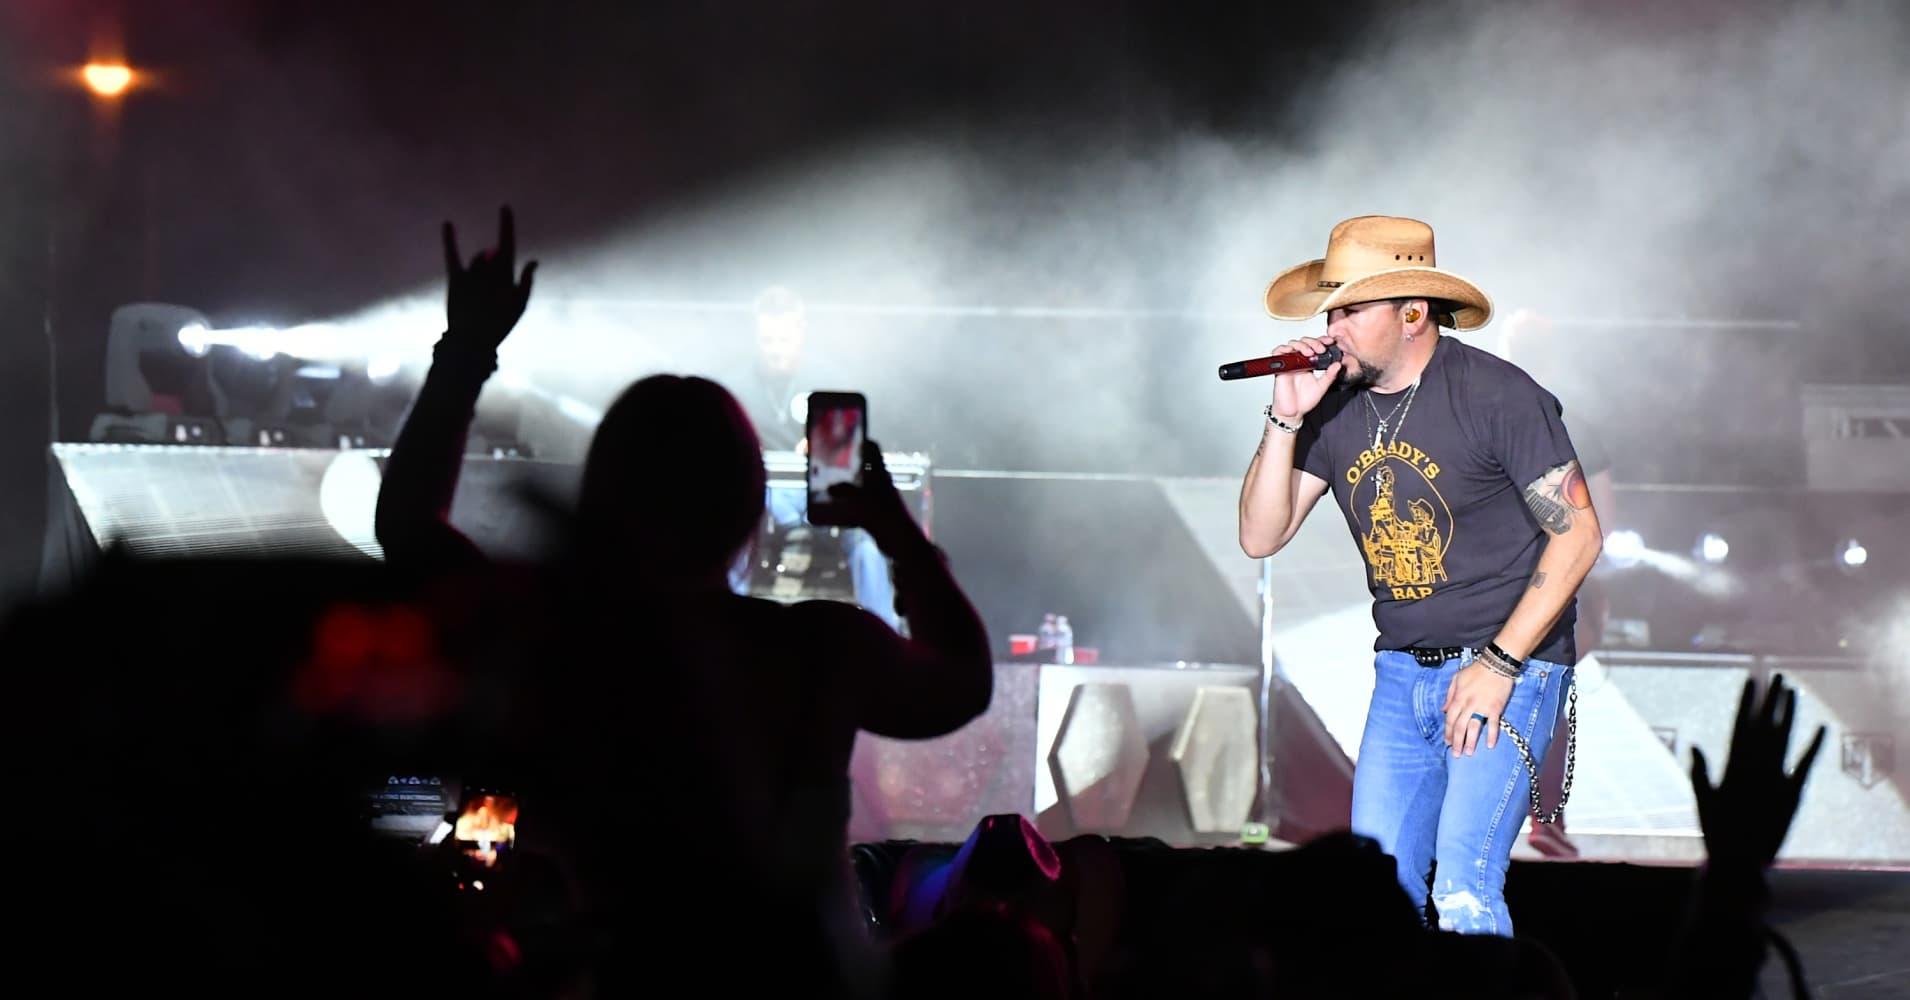 Jason Aldean Cancels Three Shows Following Las Vegas Shooting